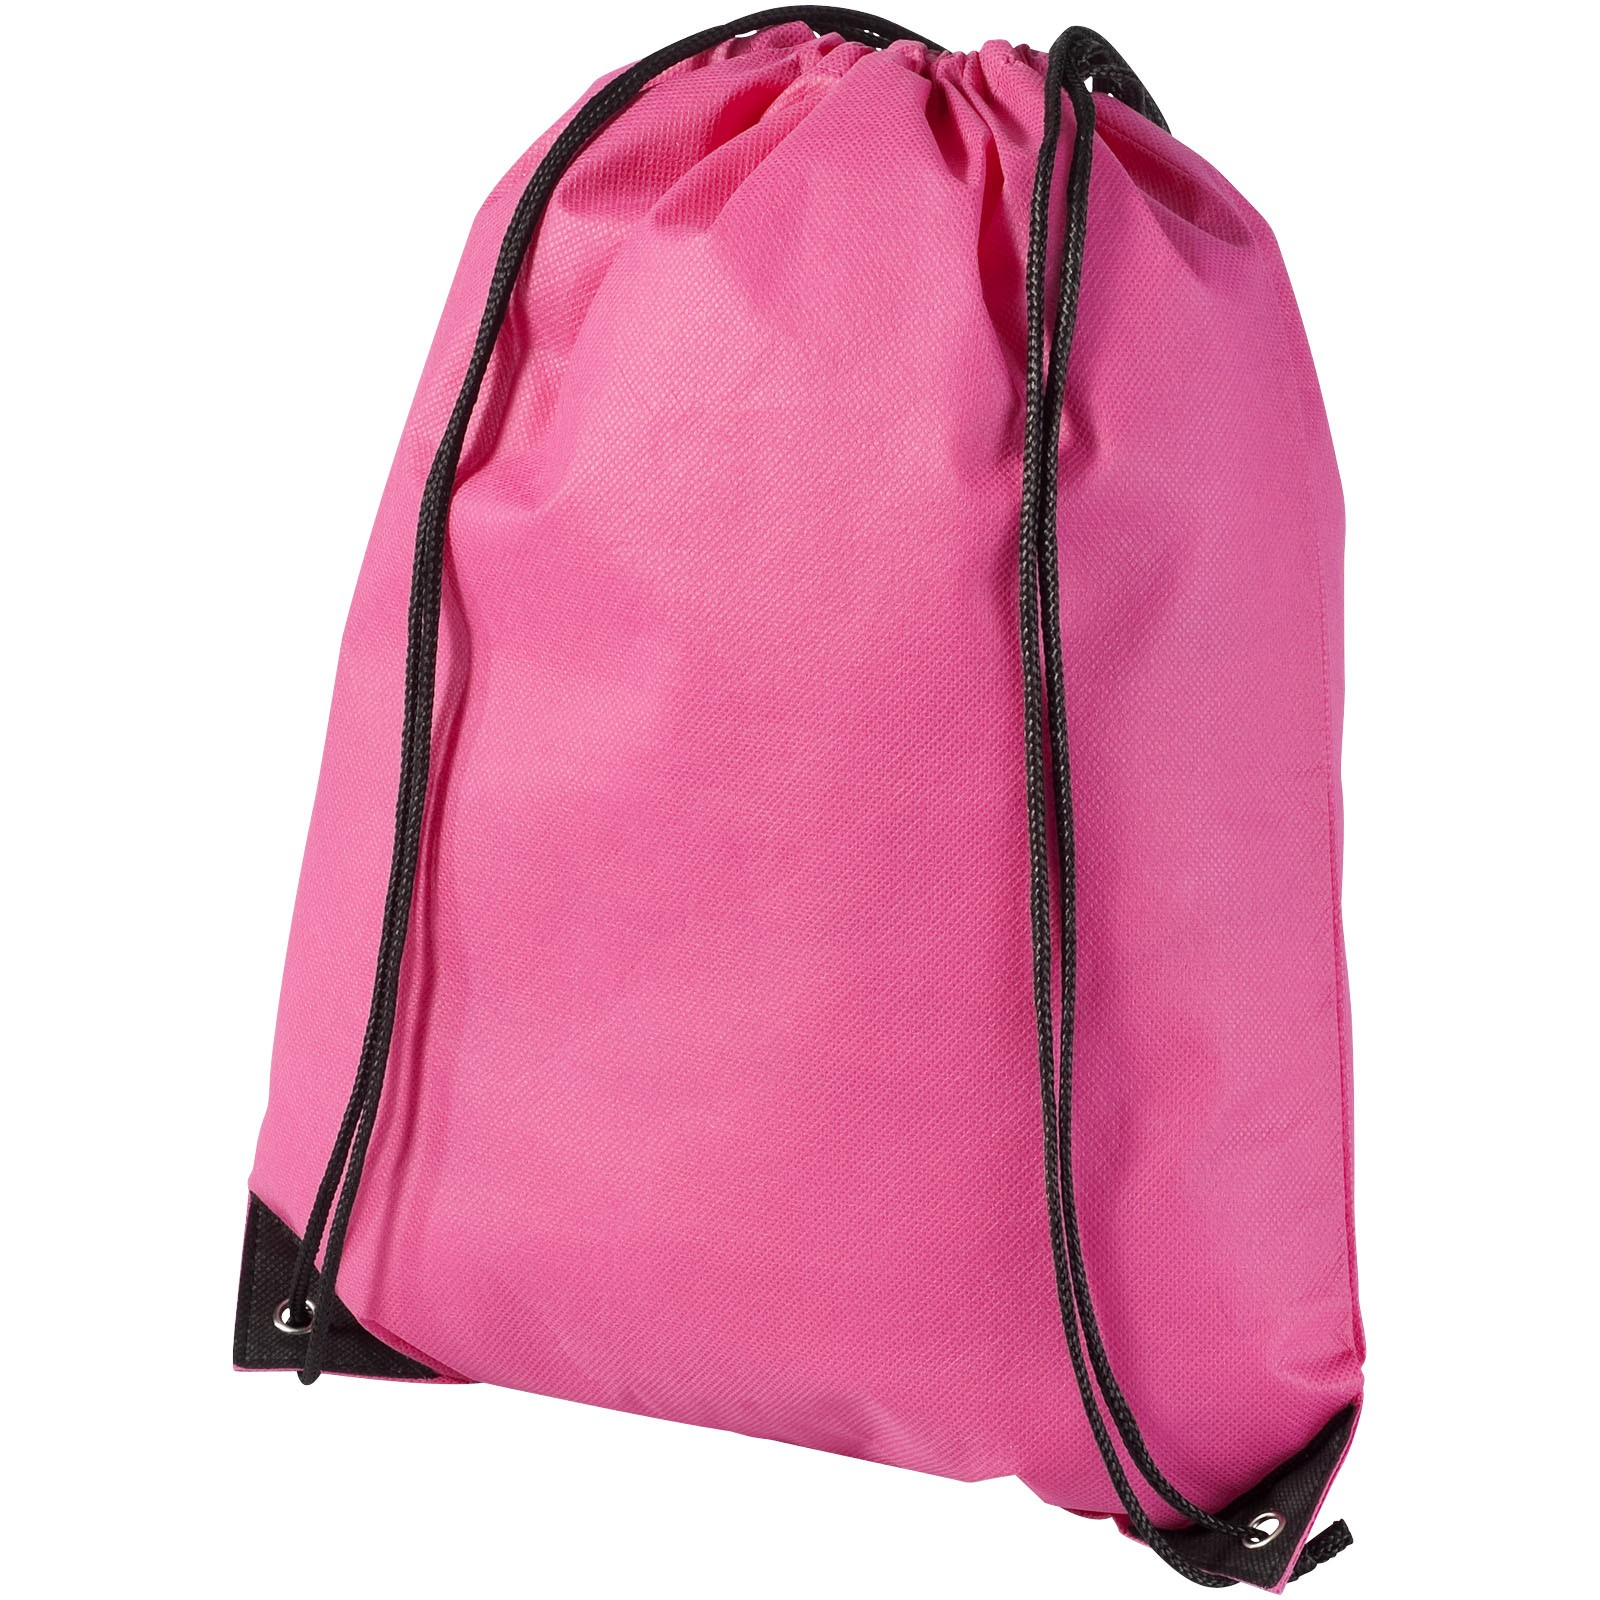 Evergreen non-woven drawstring backpack - Magenta